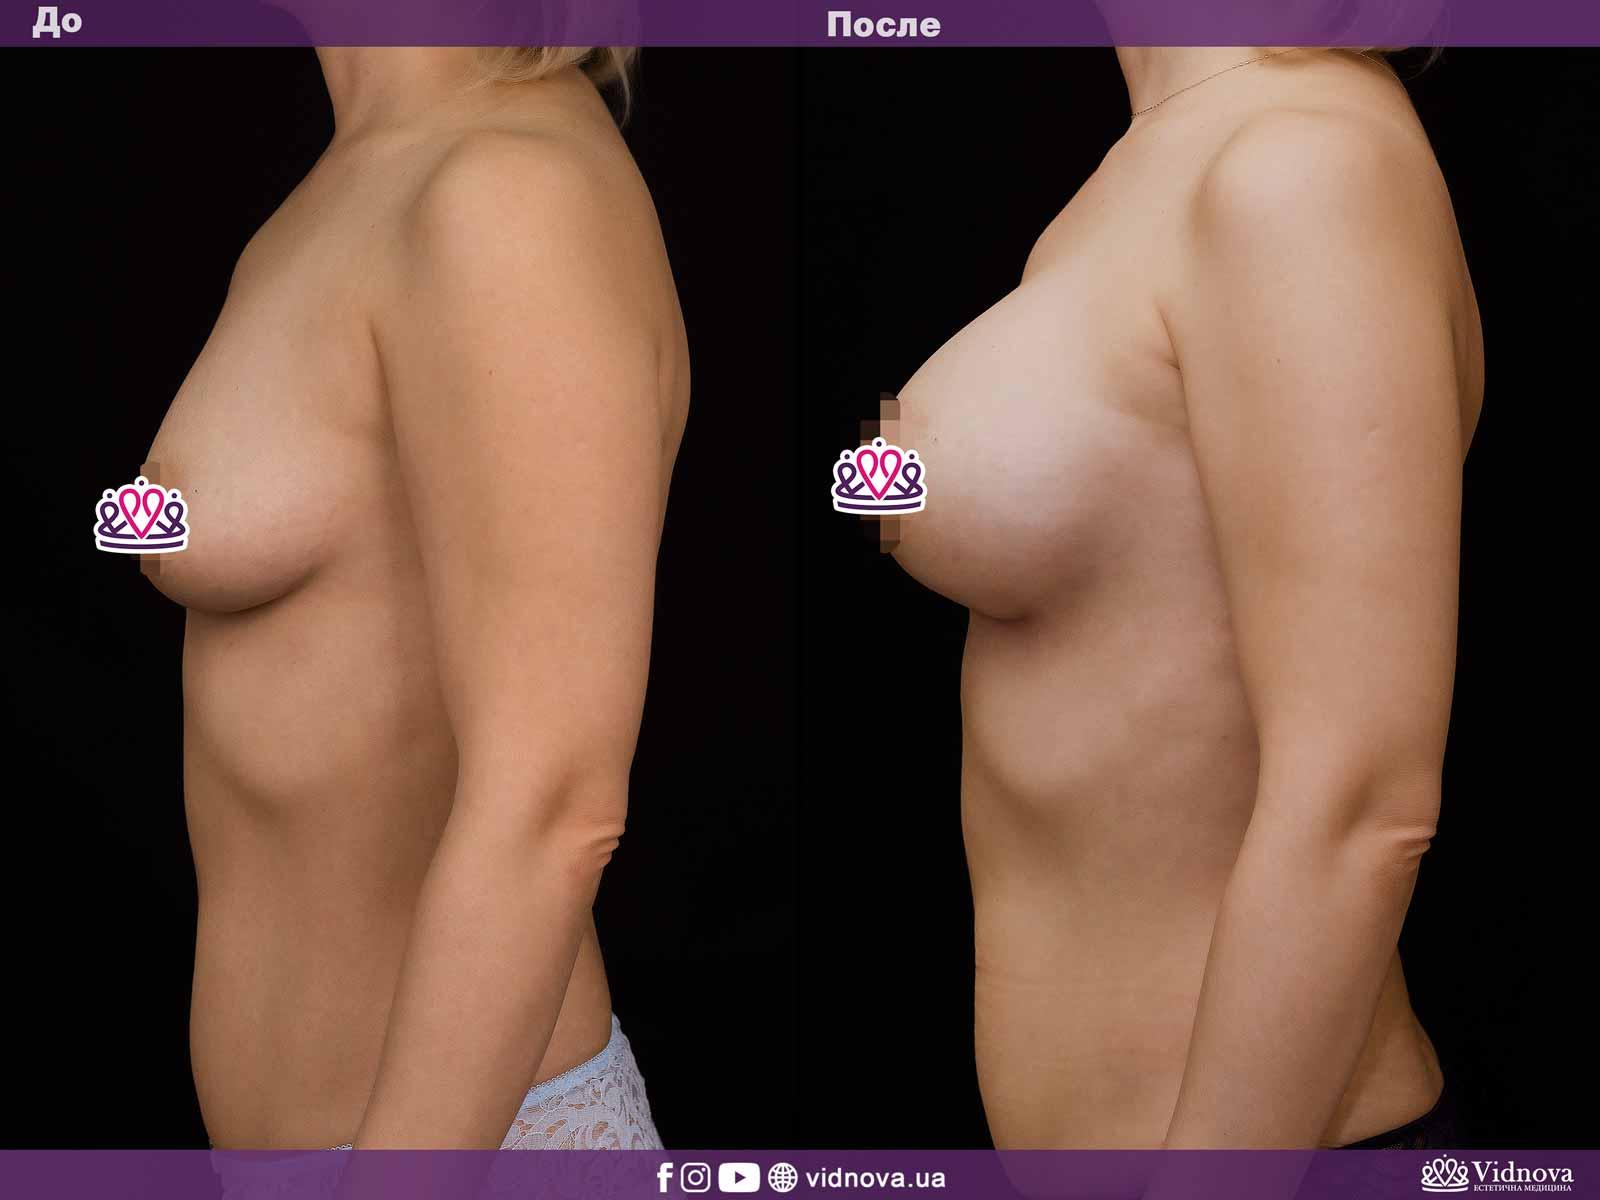 Увеличение груди: Фото ДО и ПОСЛЕ - Пример №18-3 - Клиника Vidnova